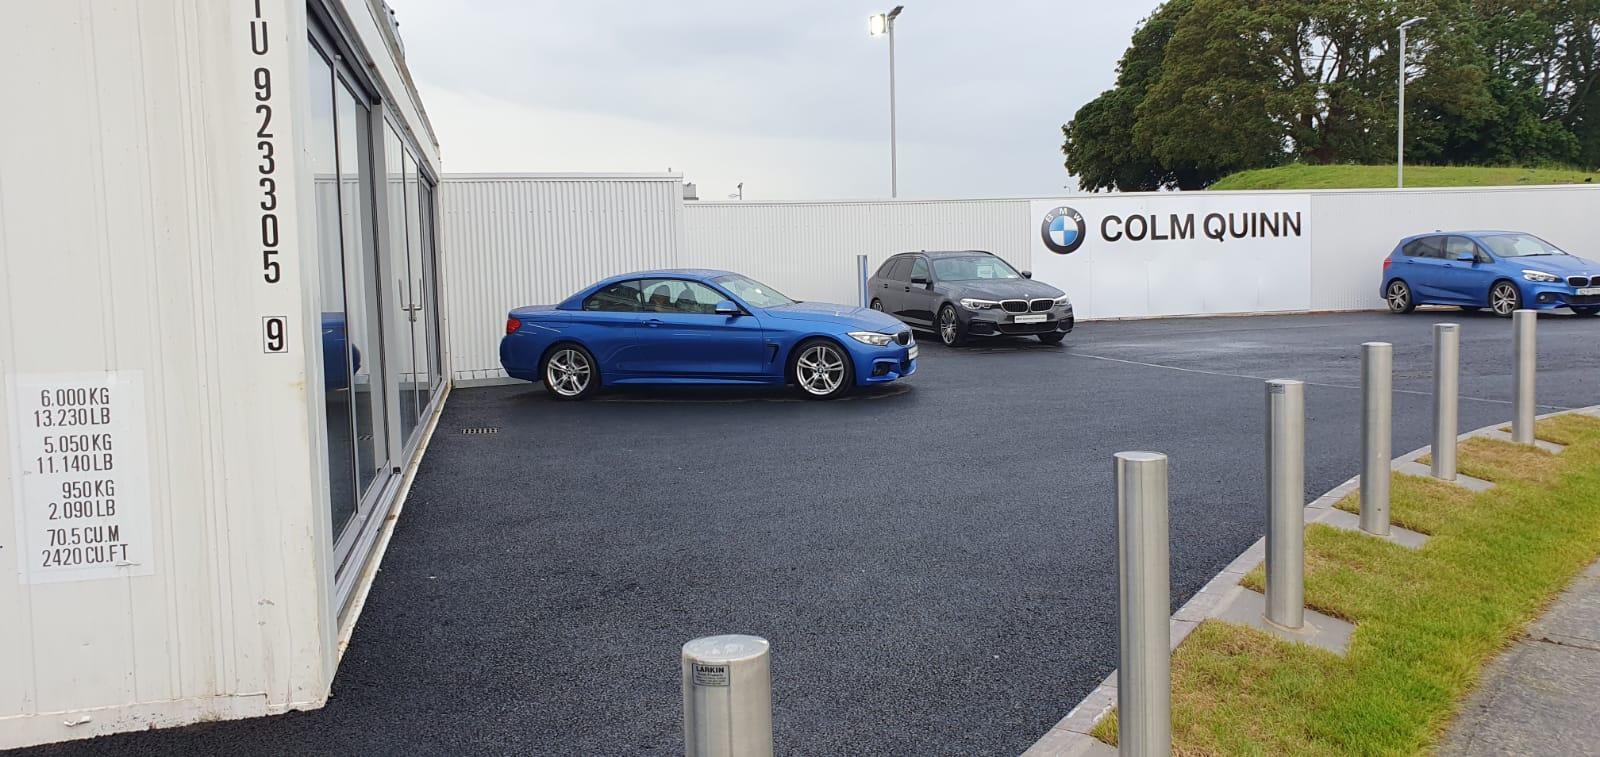 Colm Quinn BMW Show room Drogheda